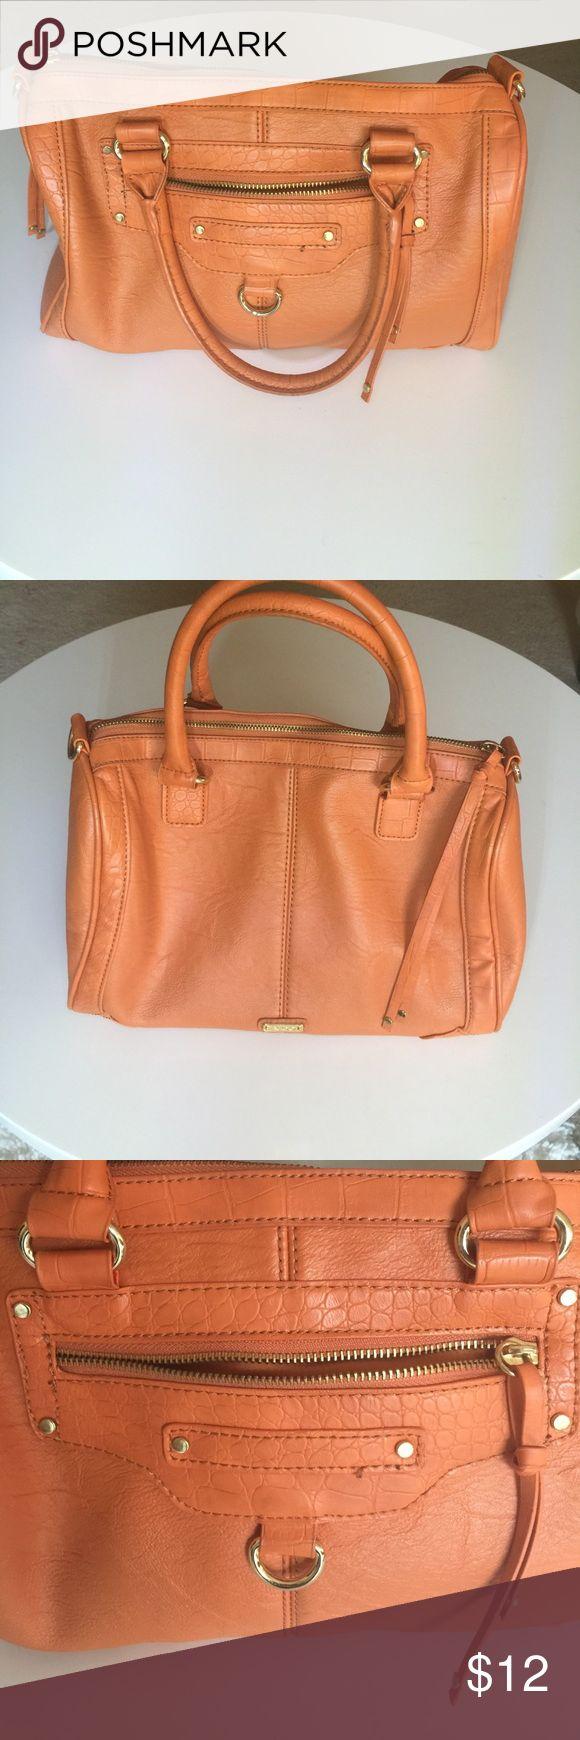 Aldo Purse Orange satchel, that can be worn as a cross body. Strap is detachable. In good condition. Aldo Bags Satchels